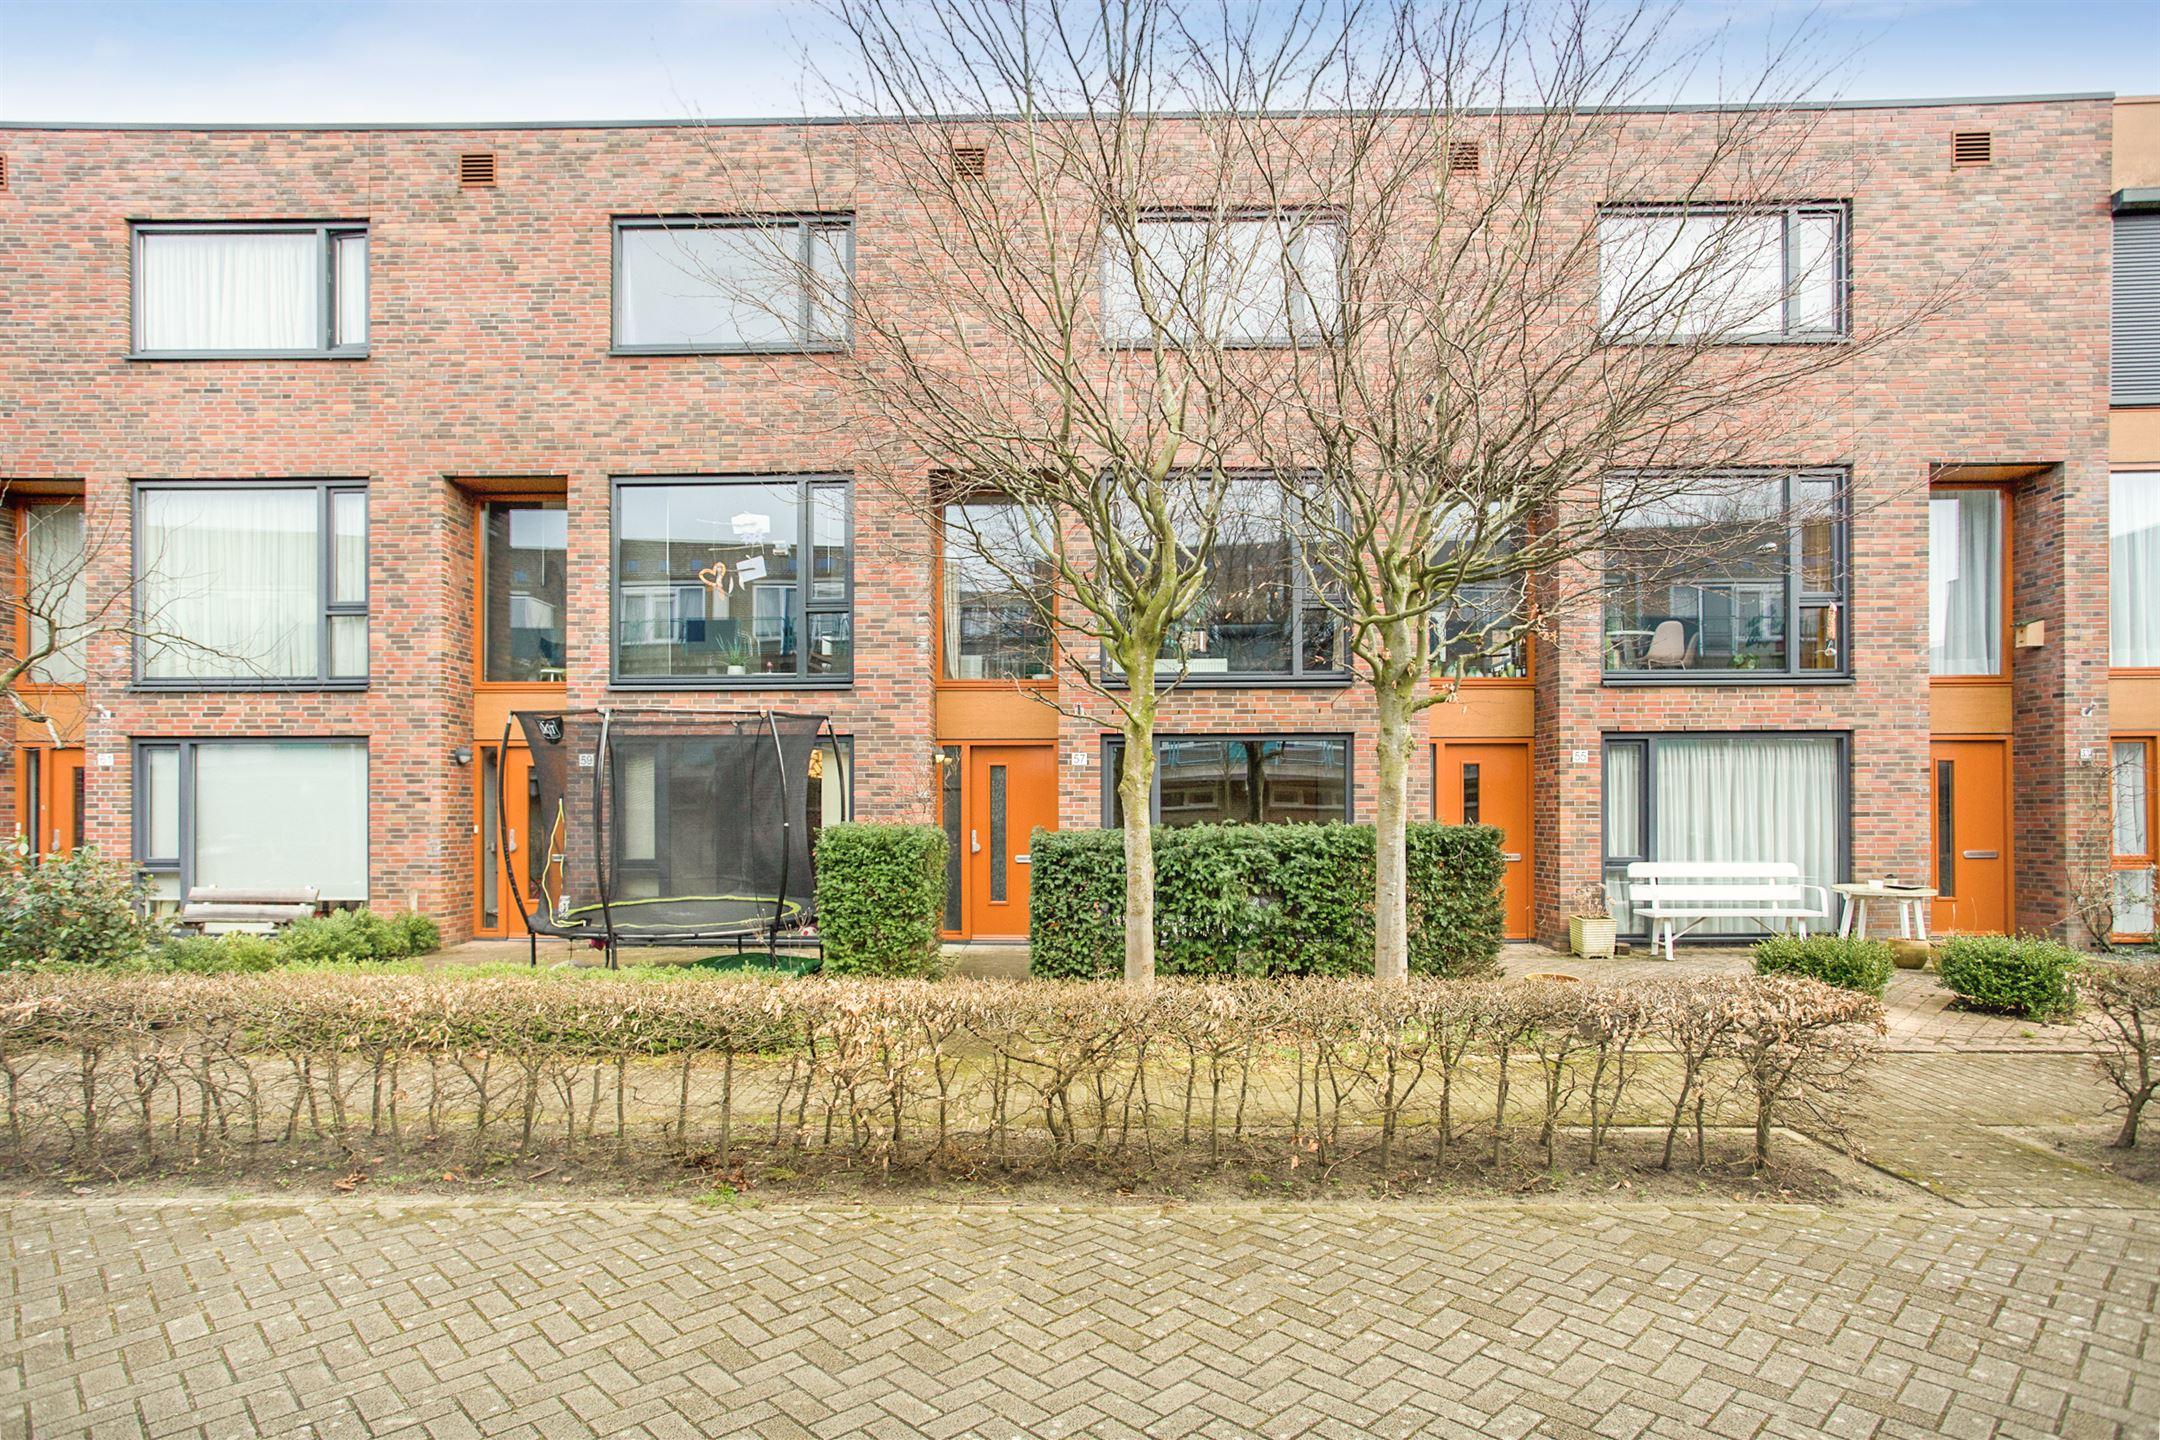 Verkocht willem hedastraat kc alkmaar funda